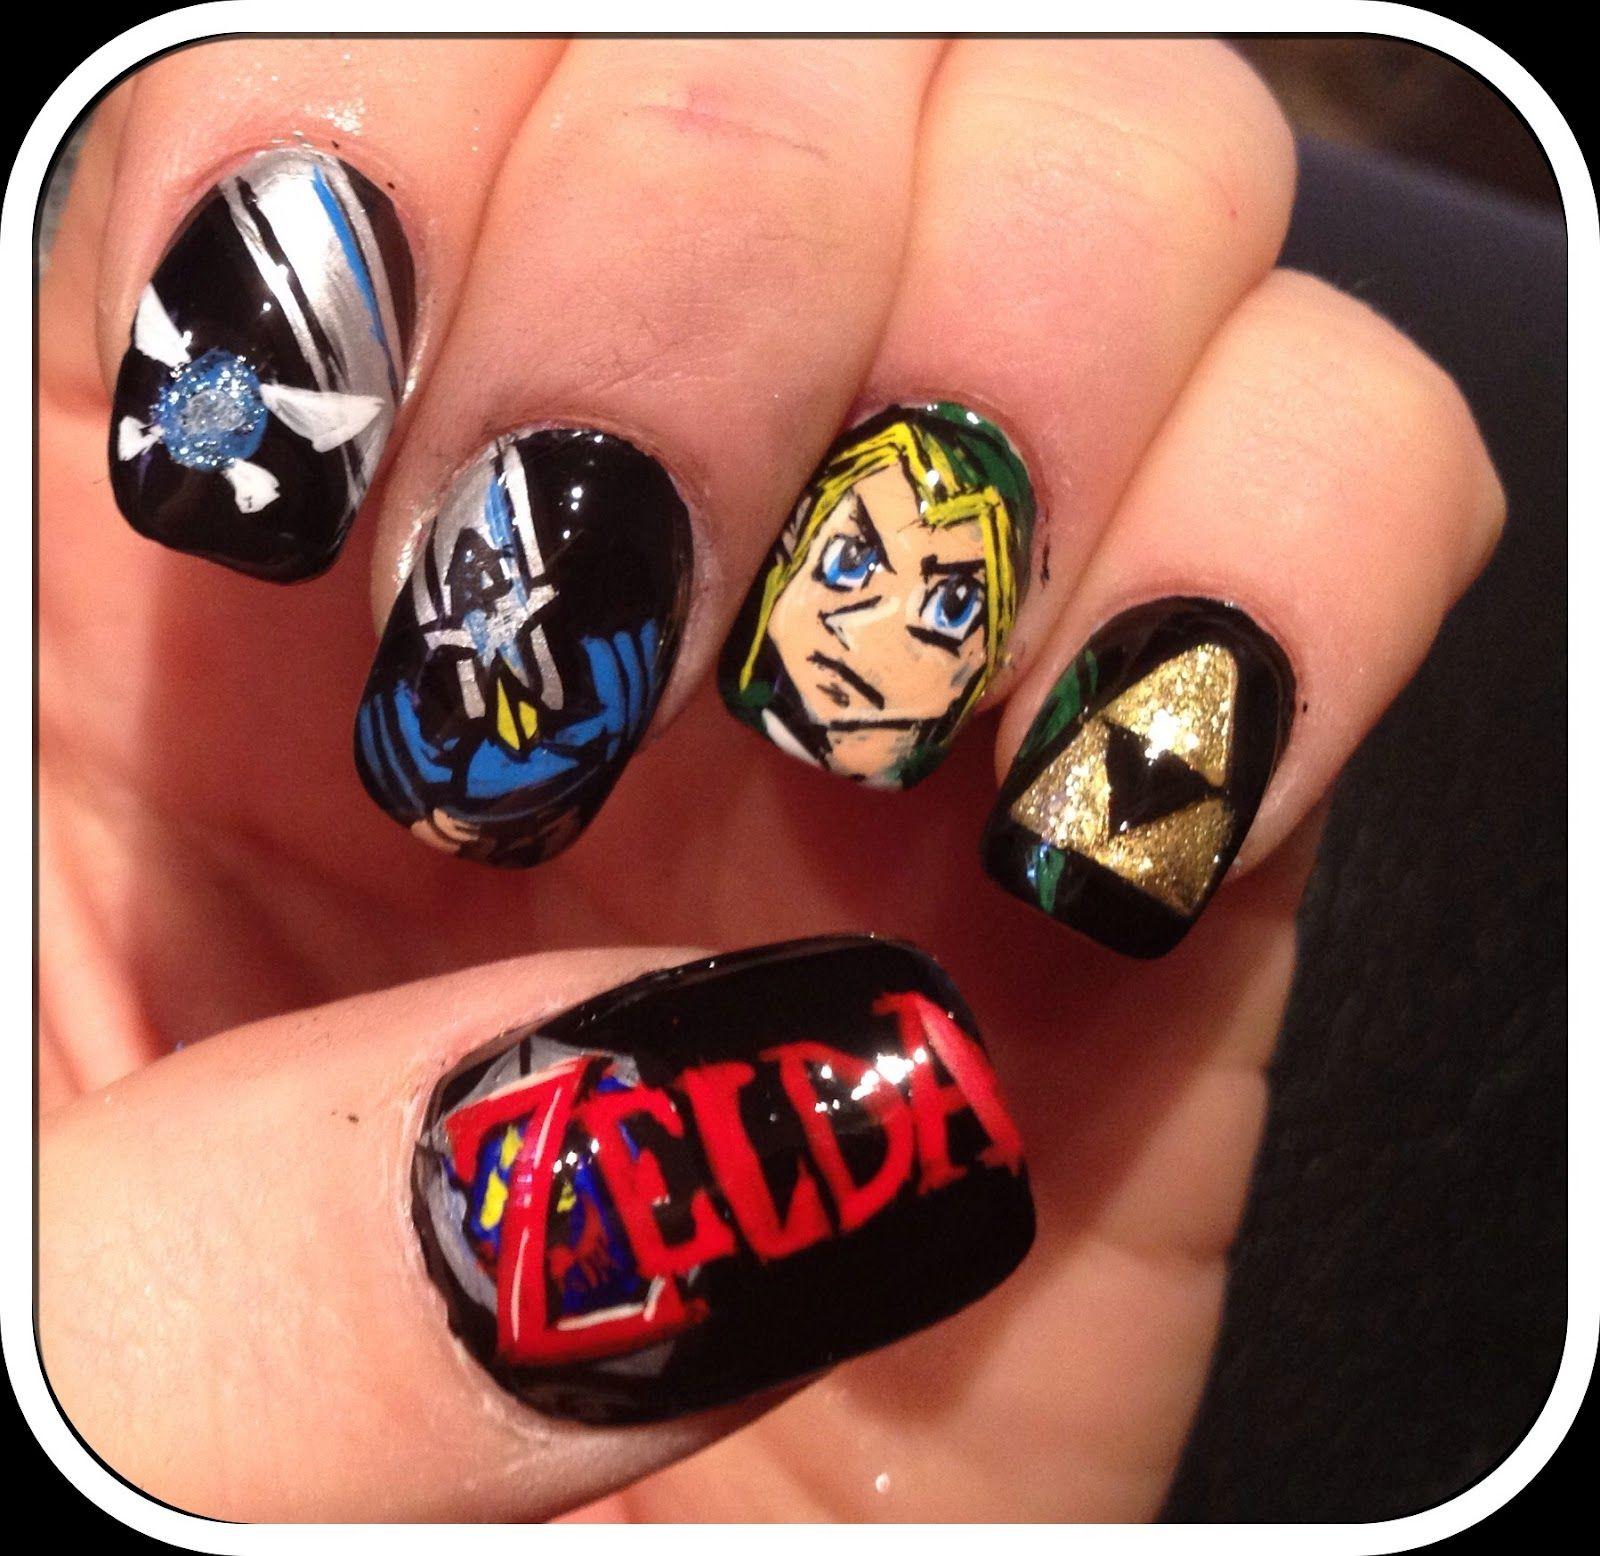 video game fingernails zelda2 | αωєѕσмє | Pinterest